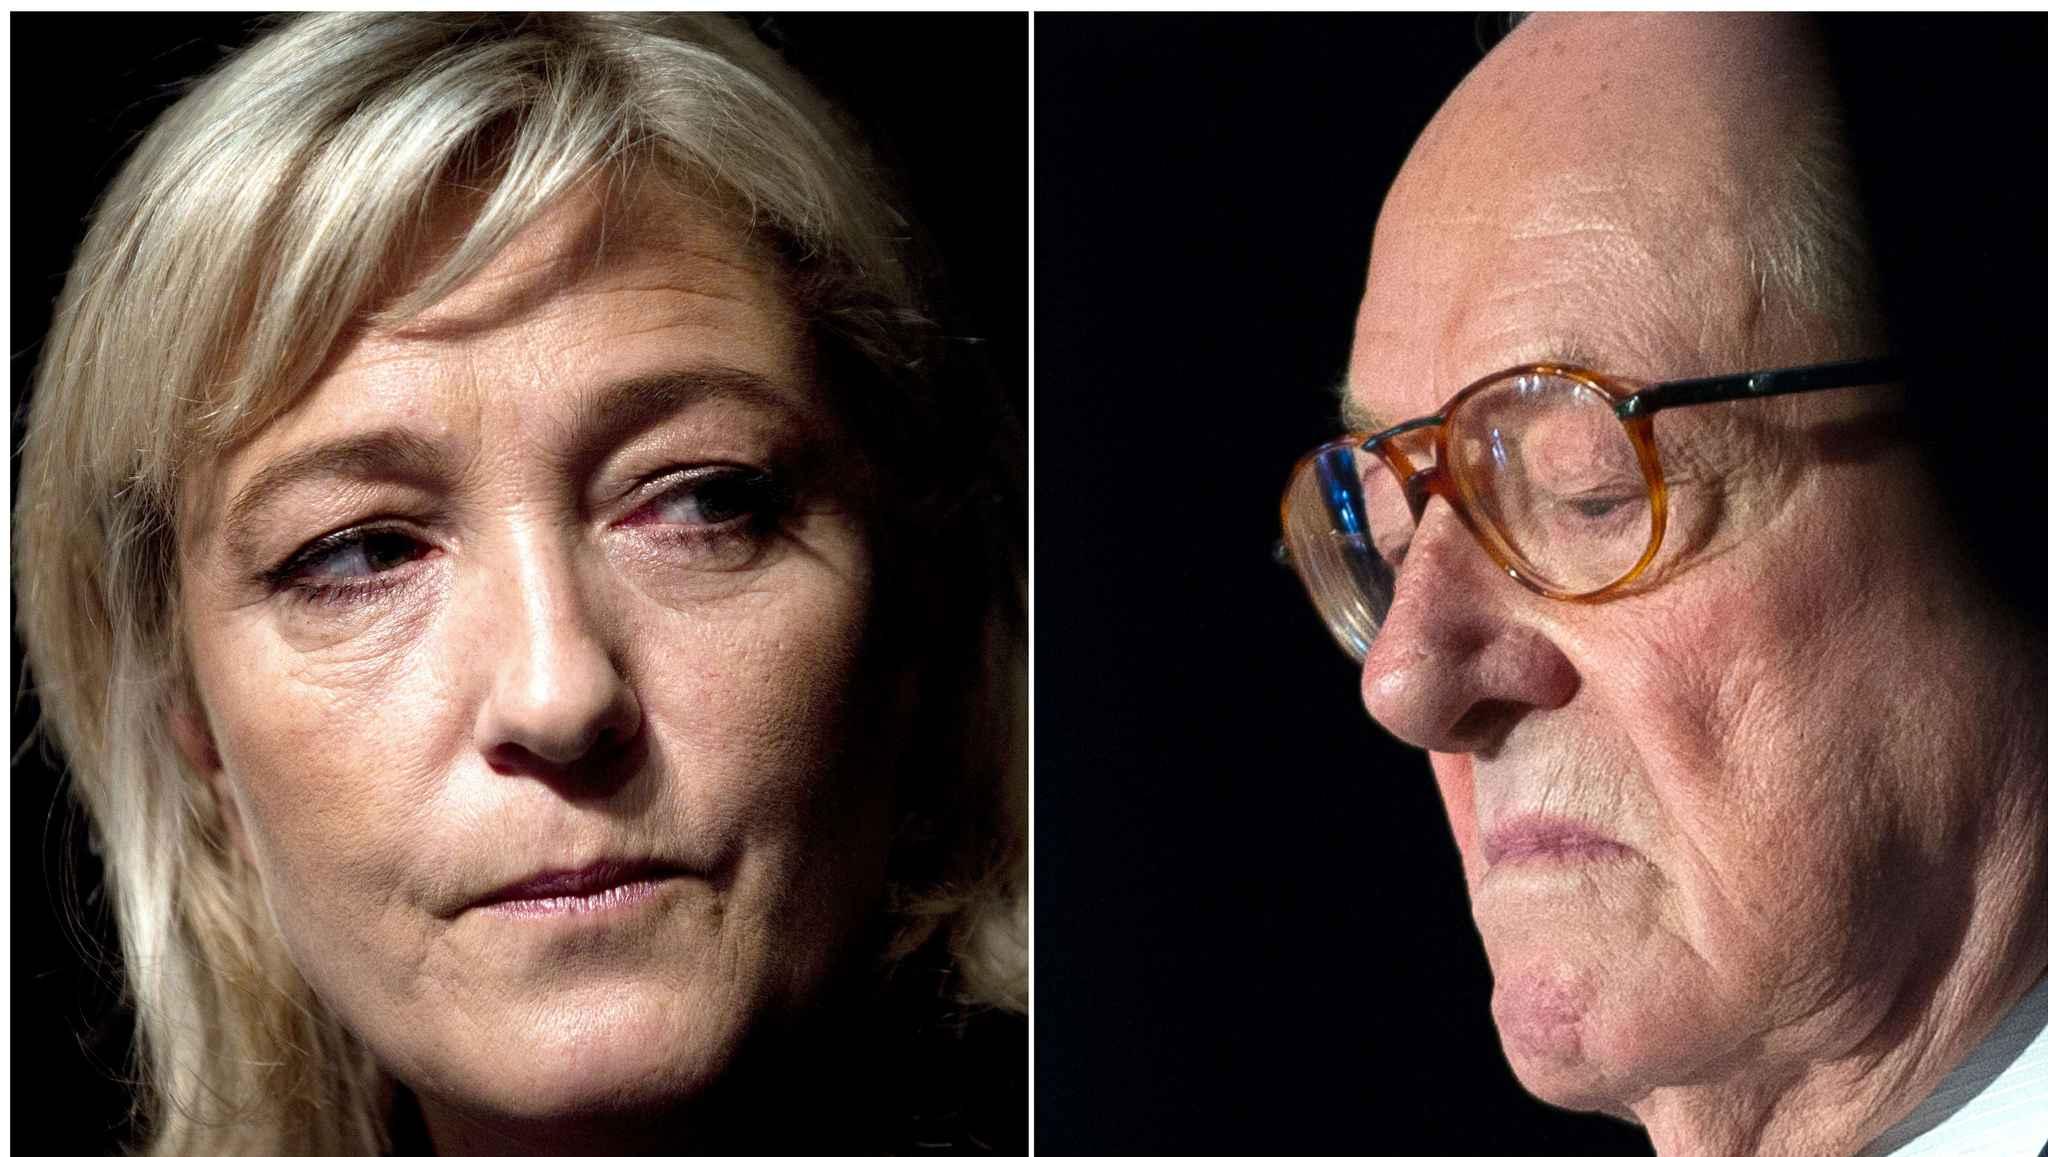 FN-Marine-Le-Pen-Jean-Marie-Le-Pen